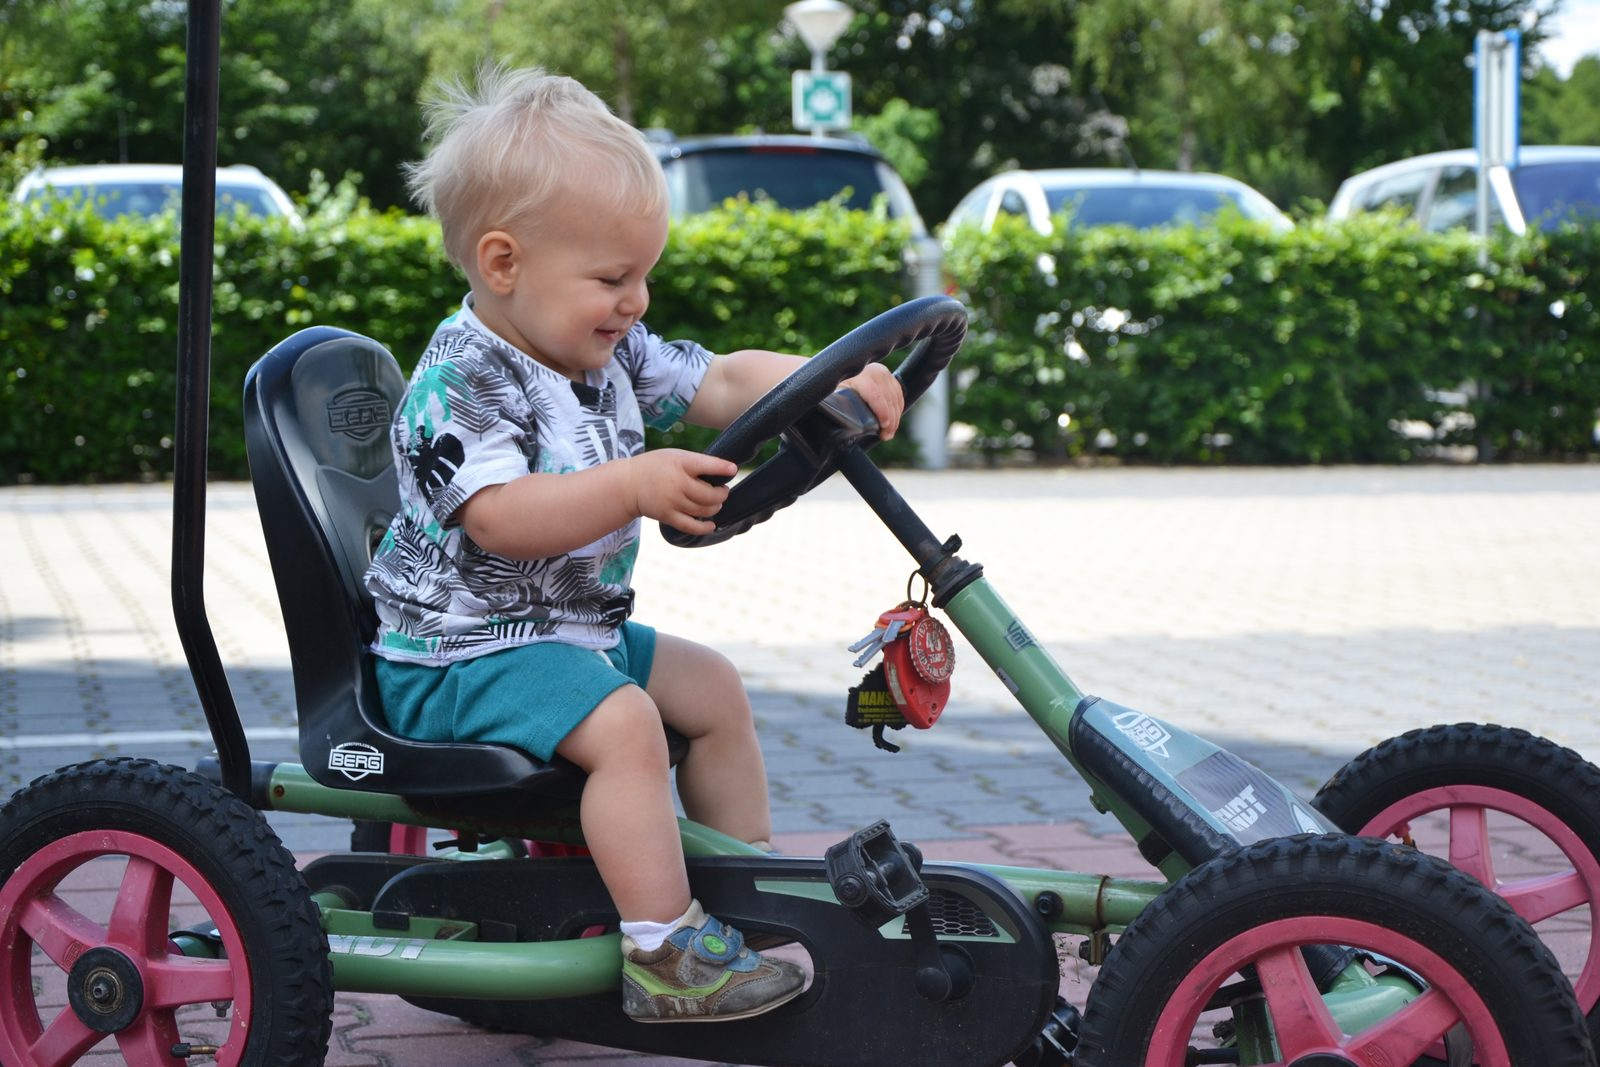 Bicycle and kart rental